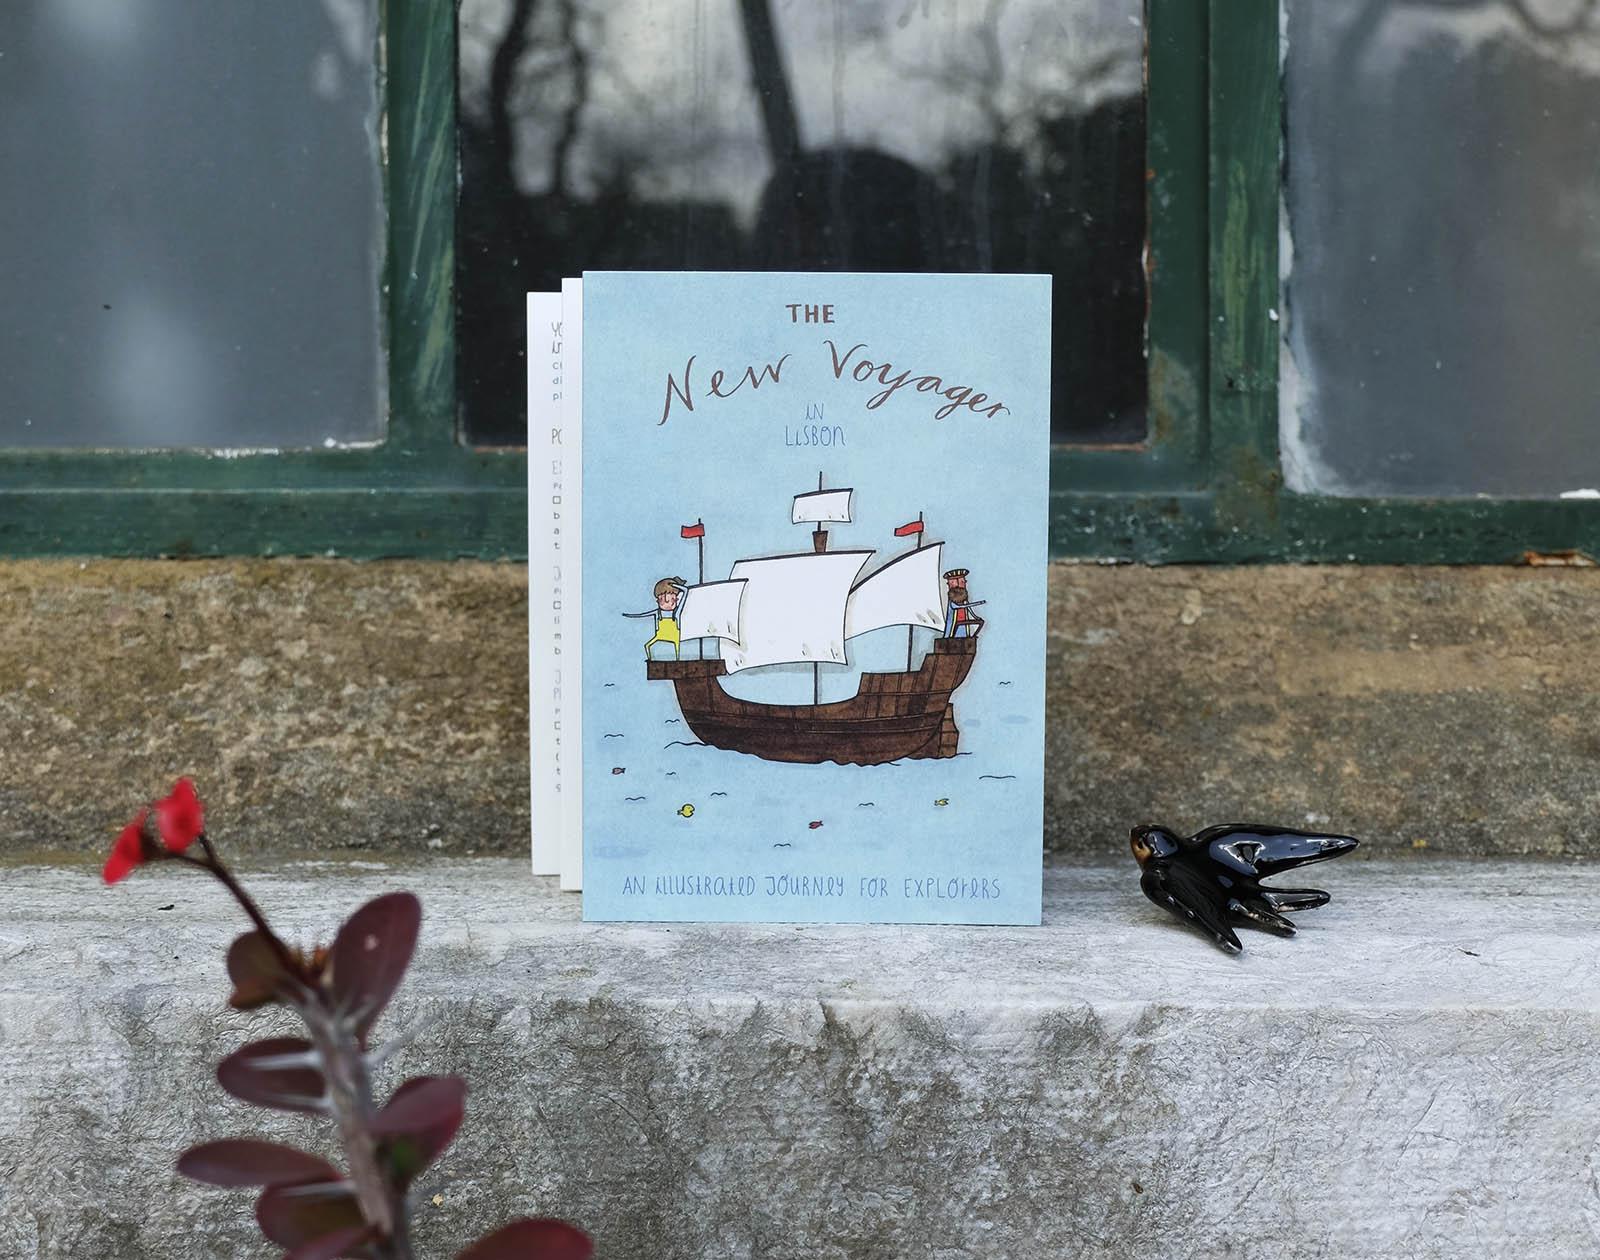 The beautiful cover by Rafaela Rodrigues